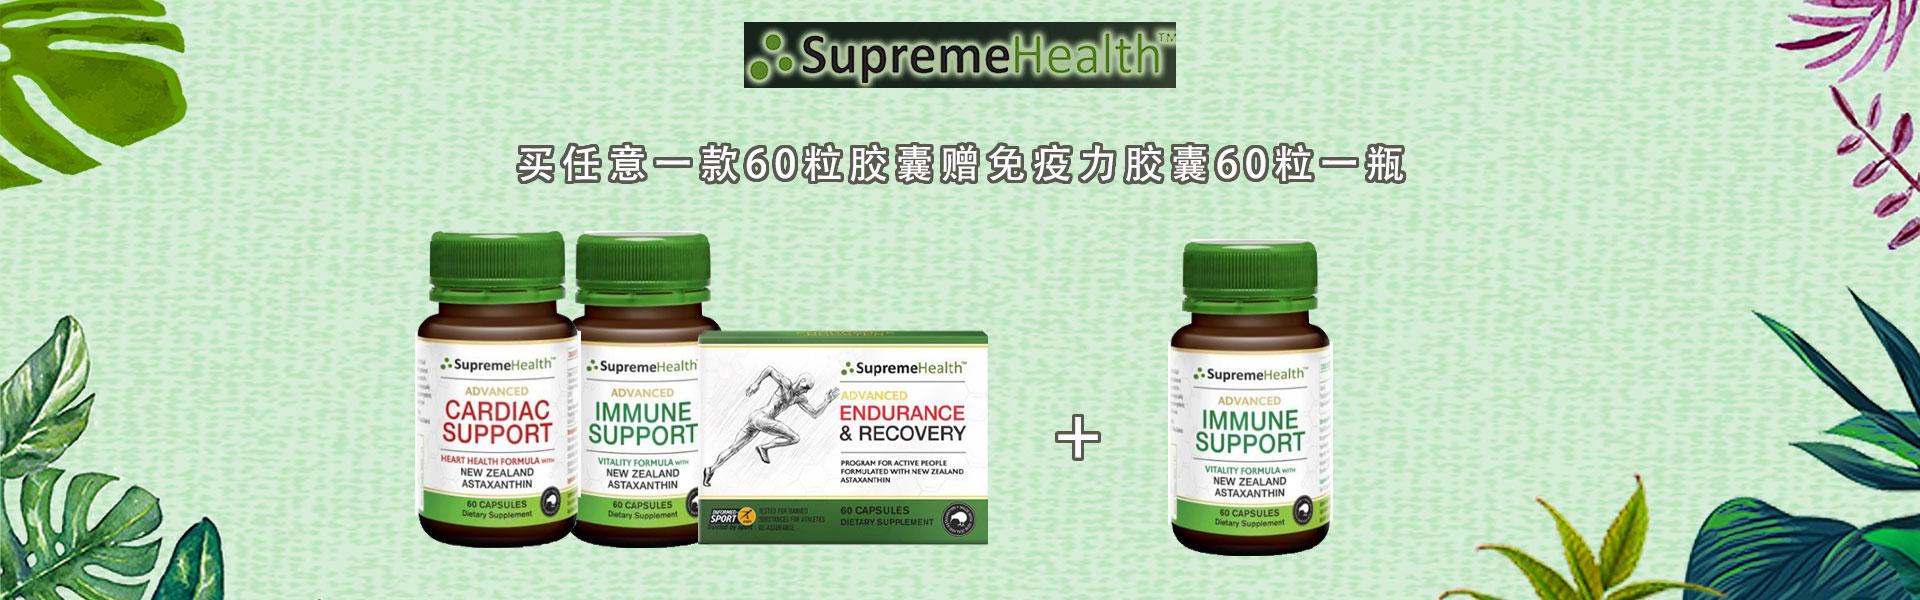 SupremeHealth任意1款赠免疫力60粒一瓶